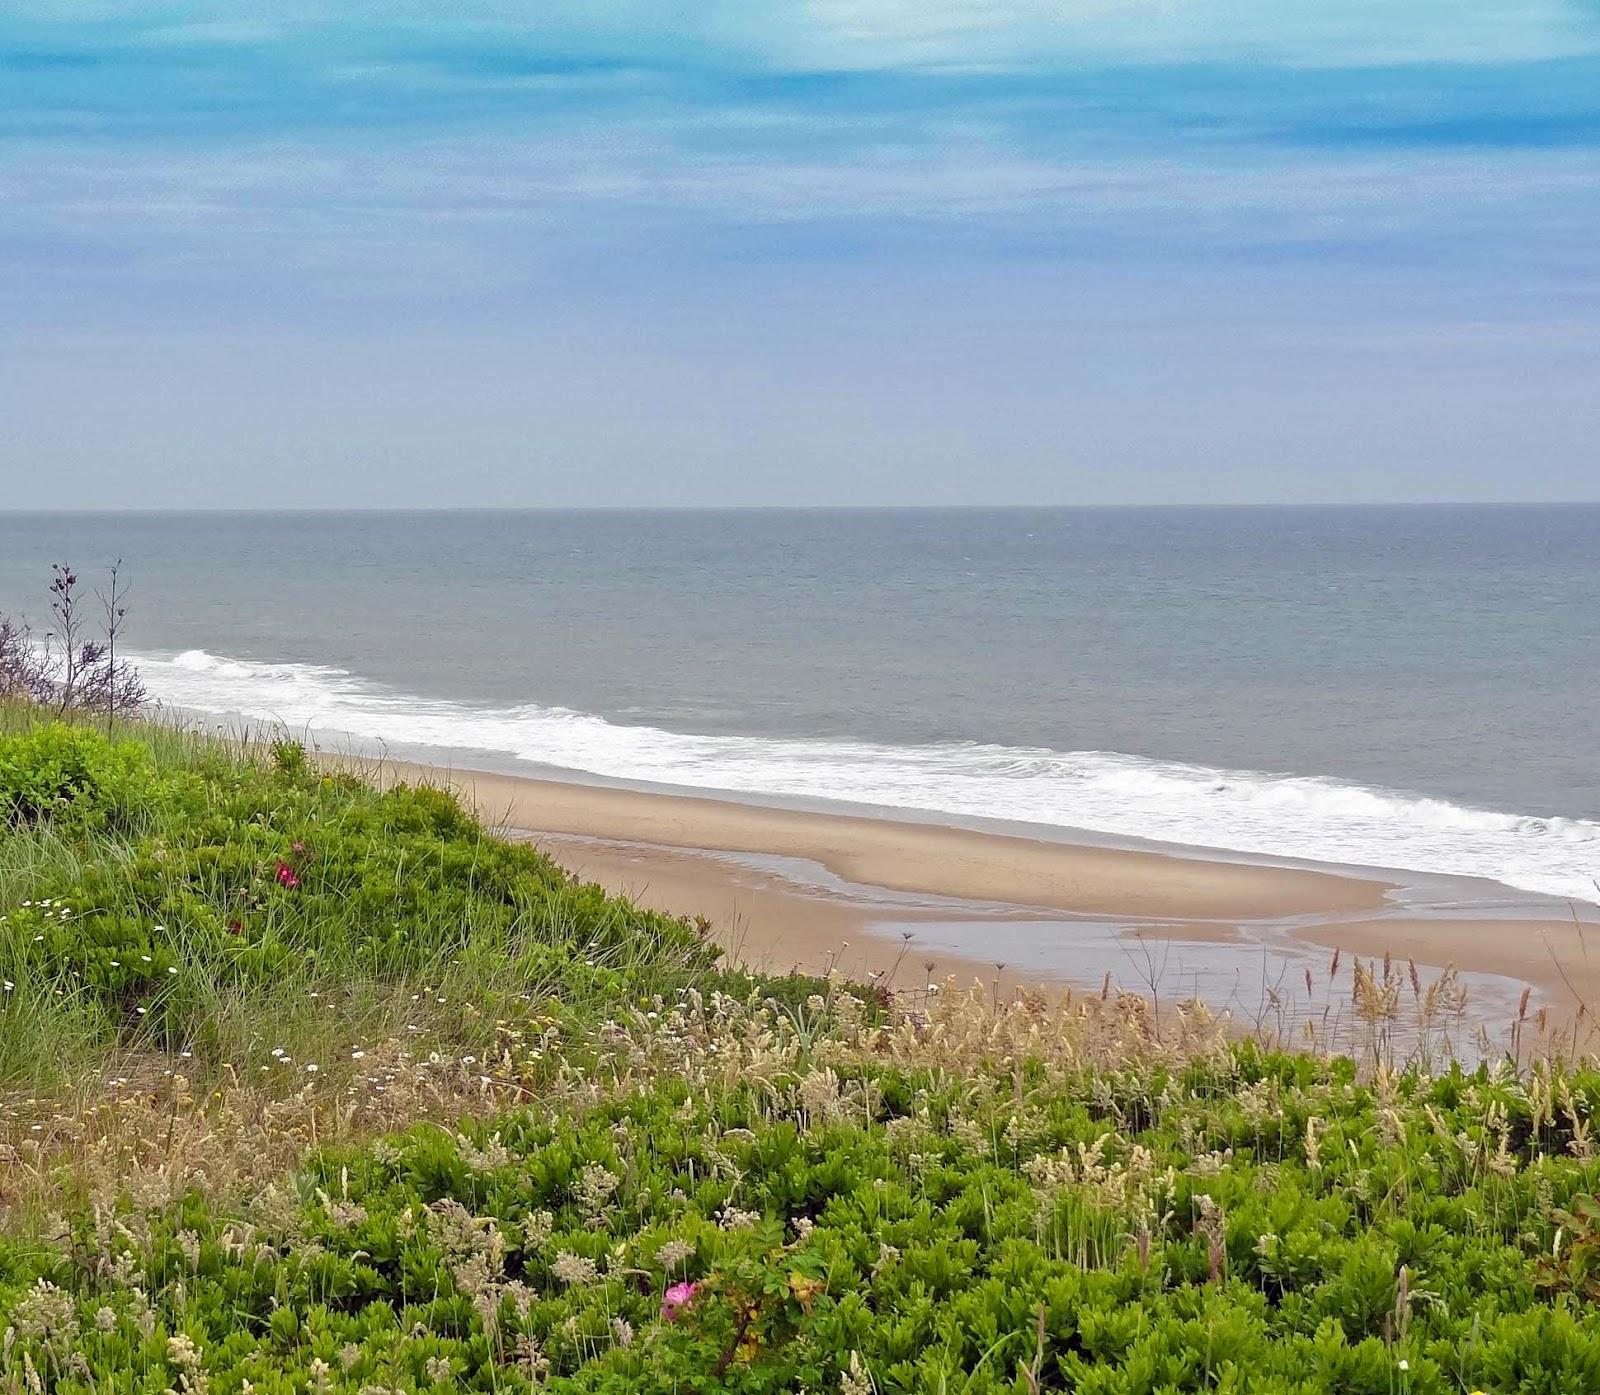 Cape Cod National Sea Shore: Joe's Retirement Blog: Cape Cod National Seashore, Nauset